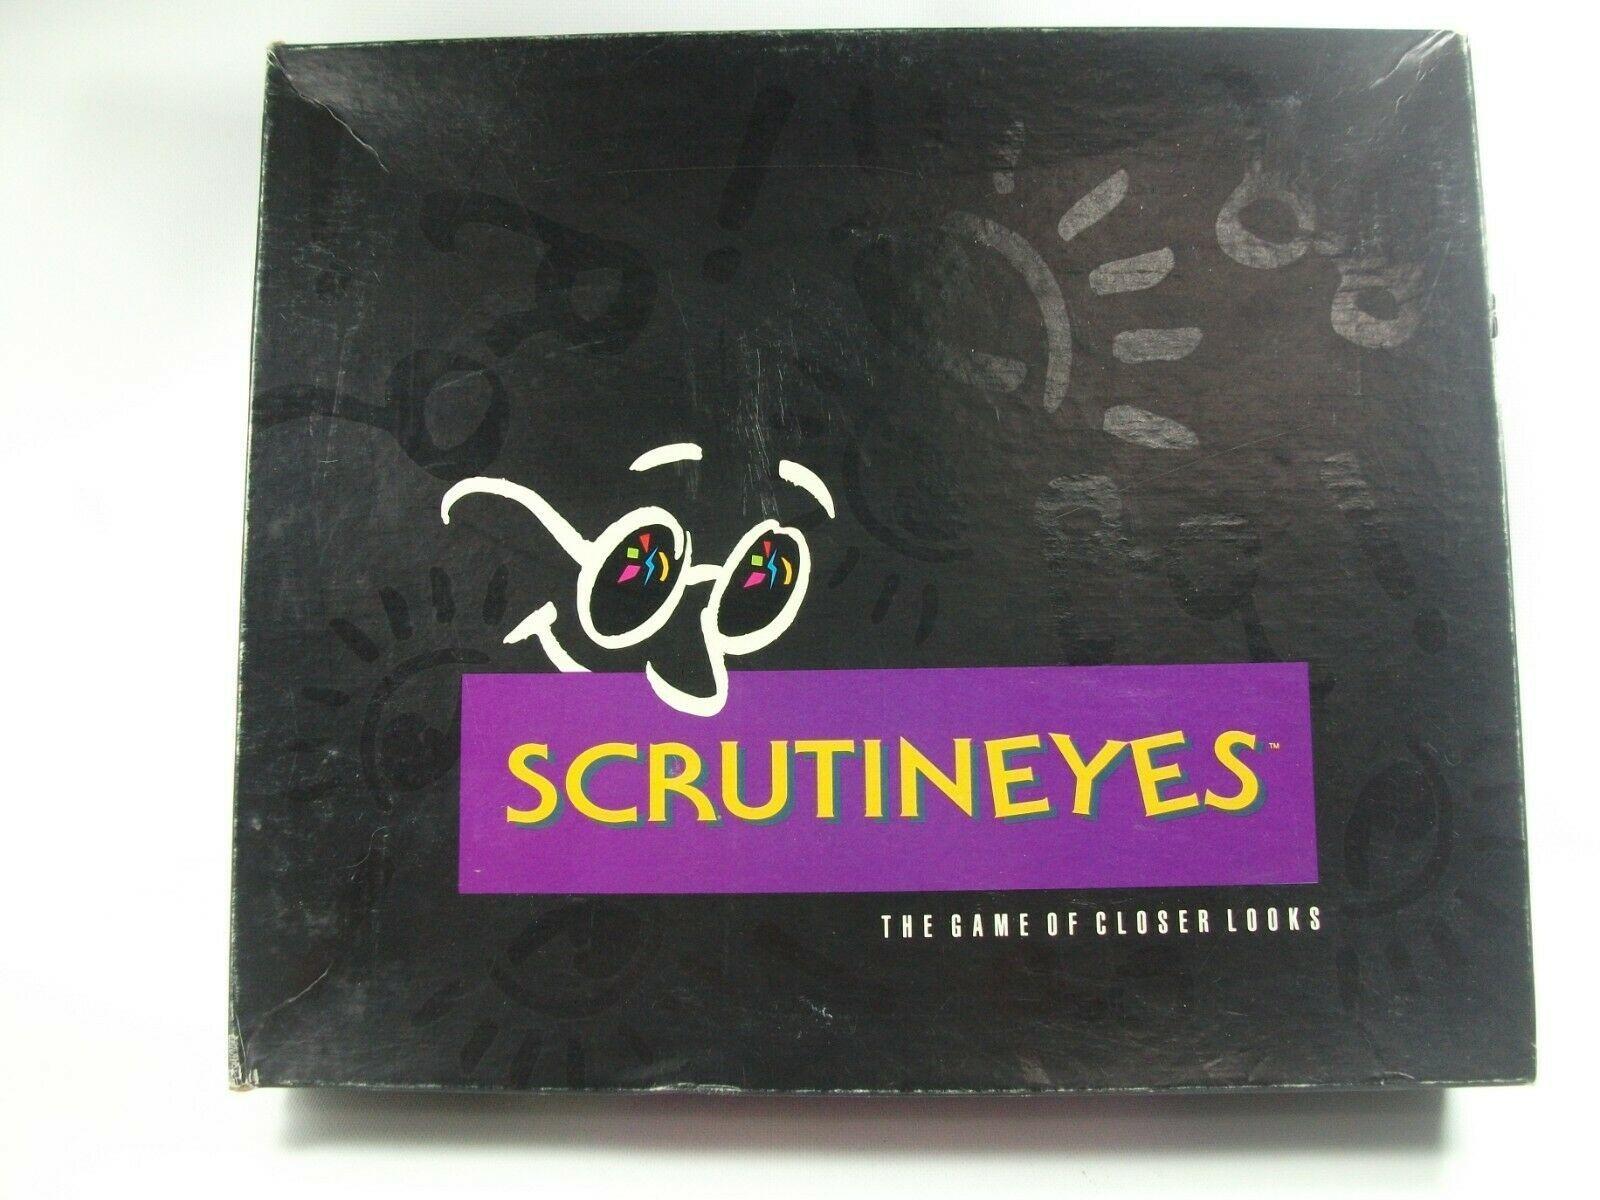 Scrutineyes Adult Game of Closer Looks Complete Vintage 1992 Mattel Board Game - $30.16